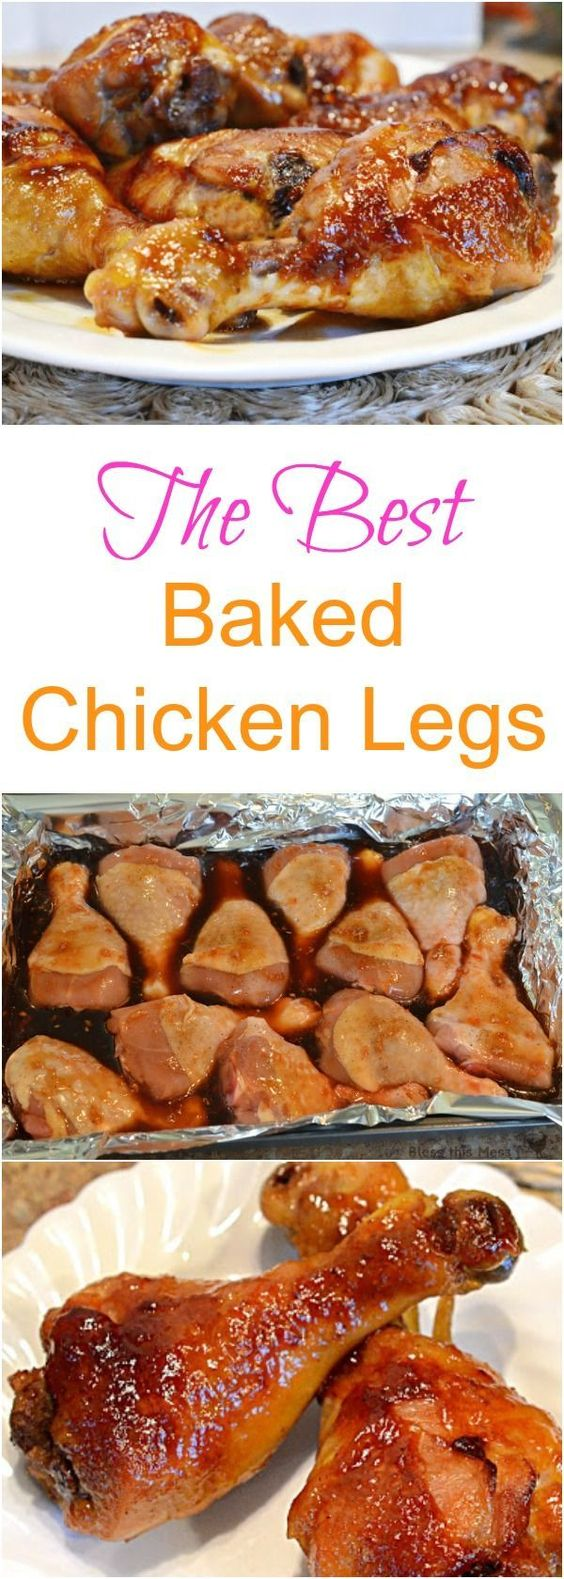 ... jays baked chicken baked chicken legs legs chicken legs chicken recipe